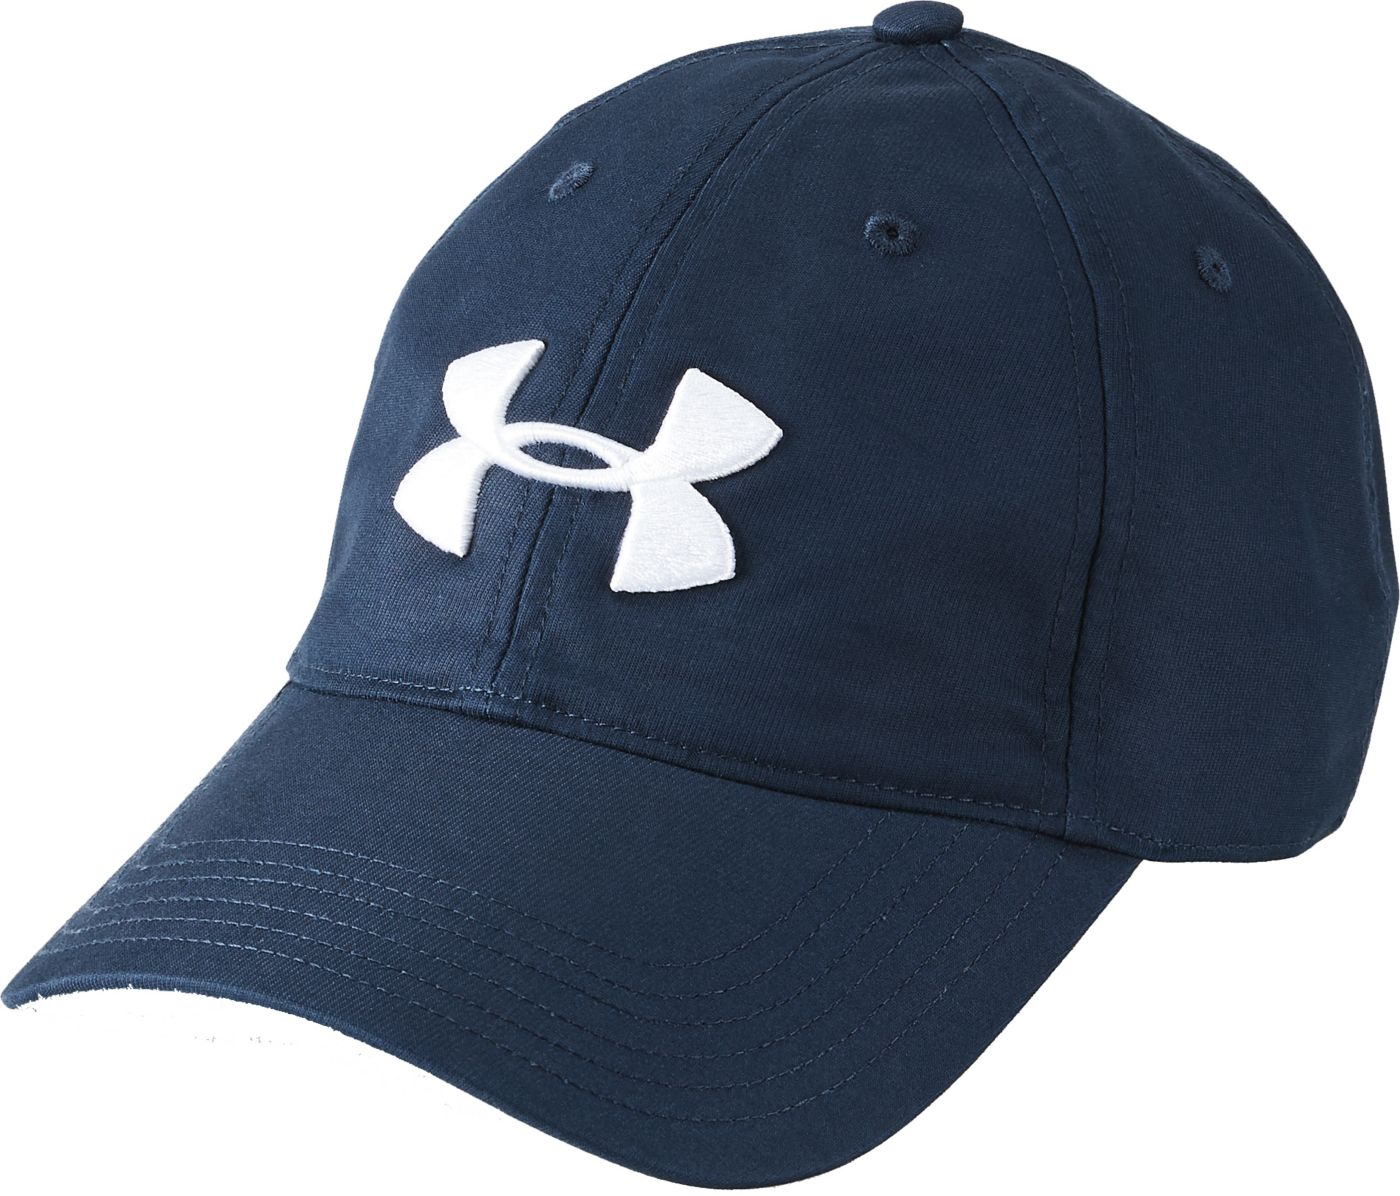 Under Armour Chino 2.0 Golf Hat